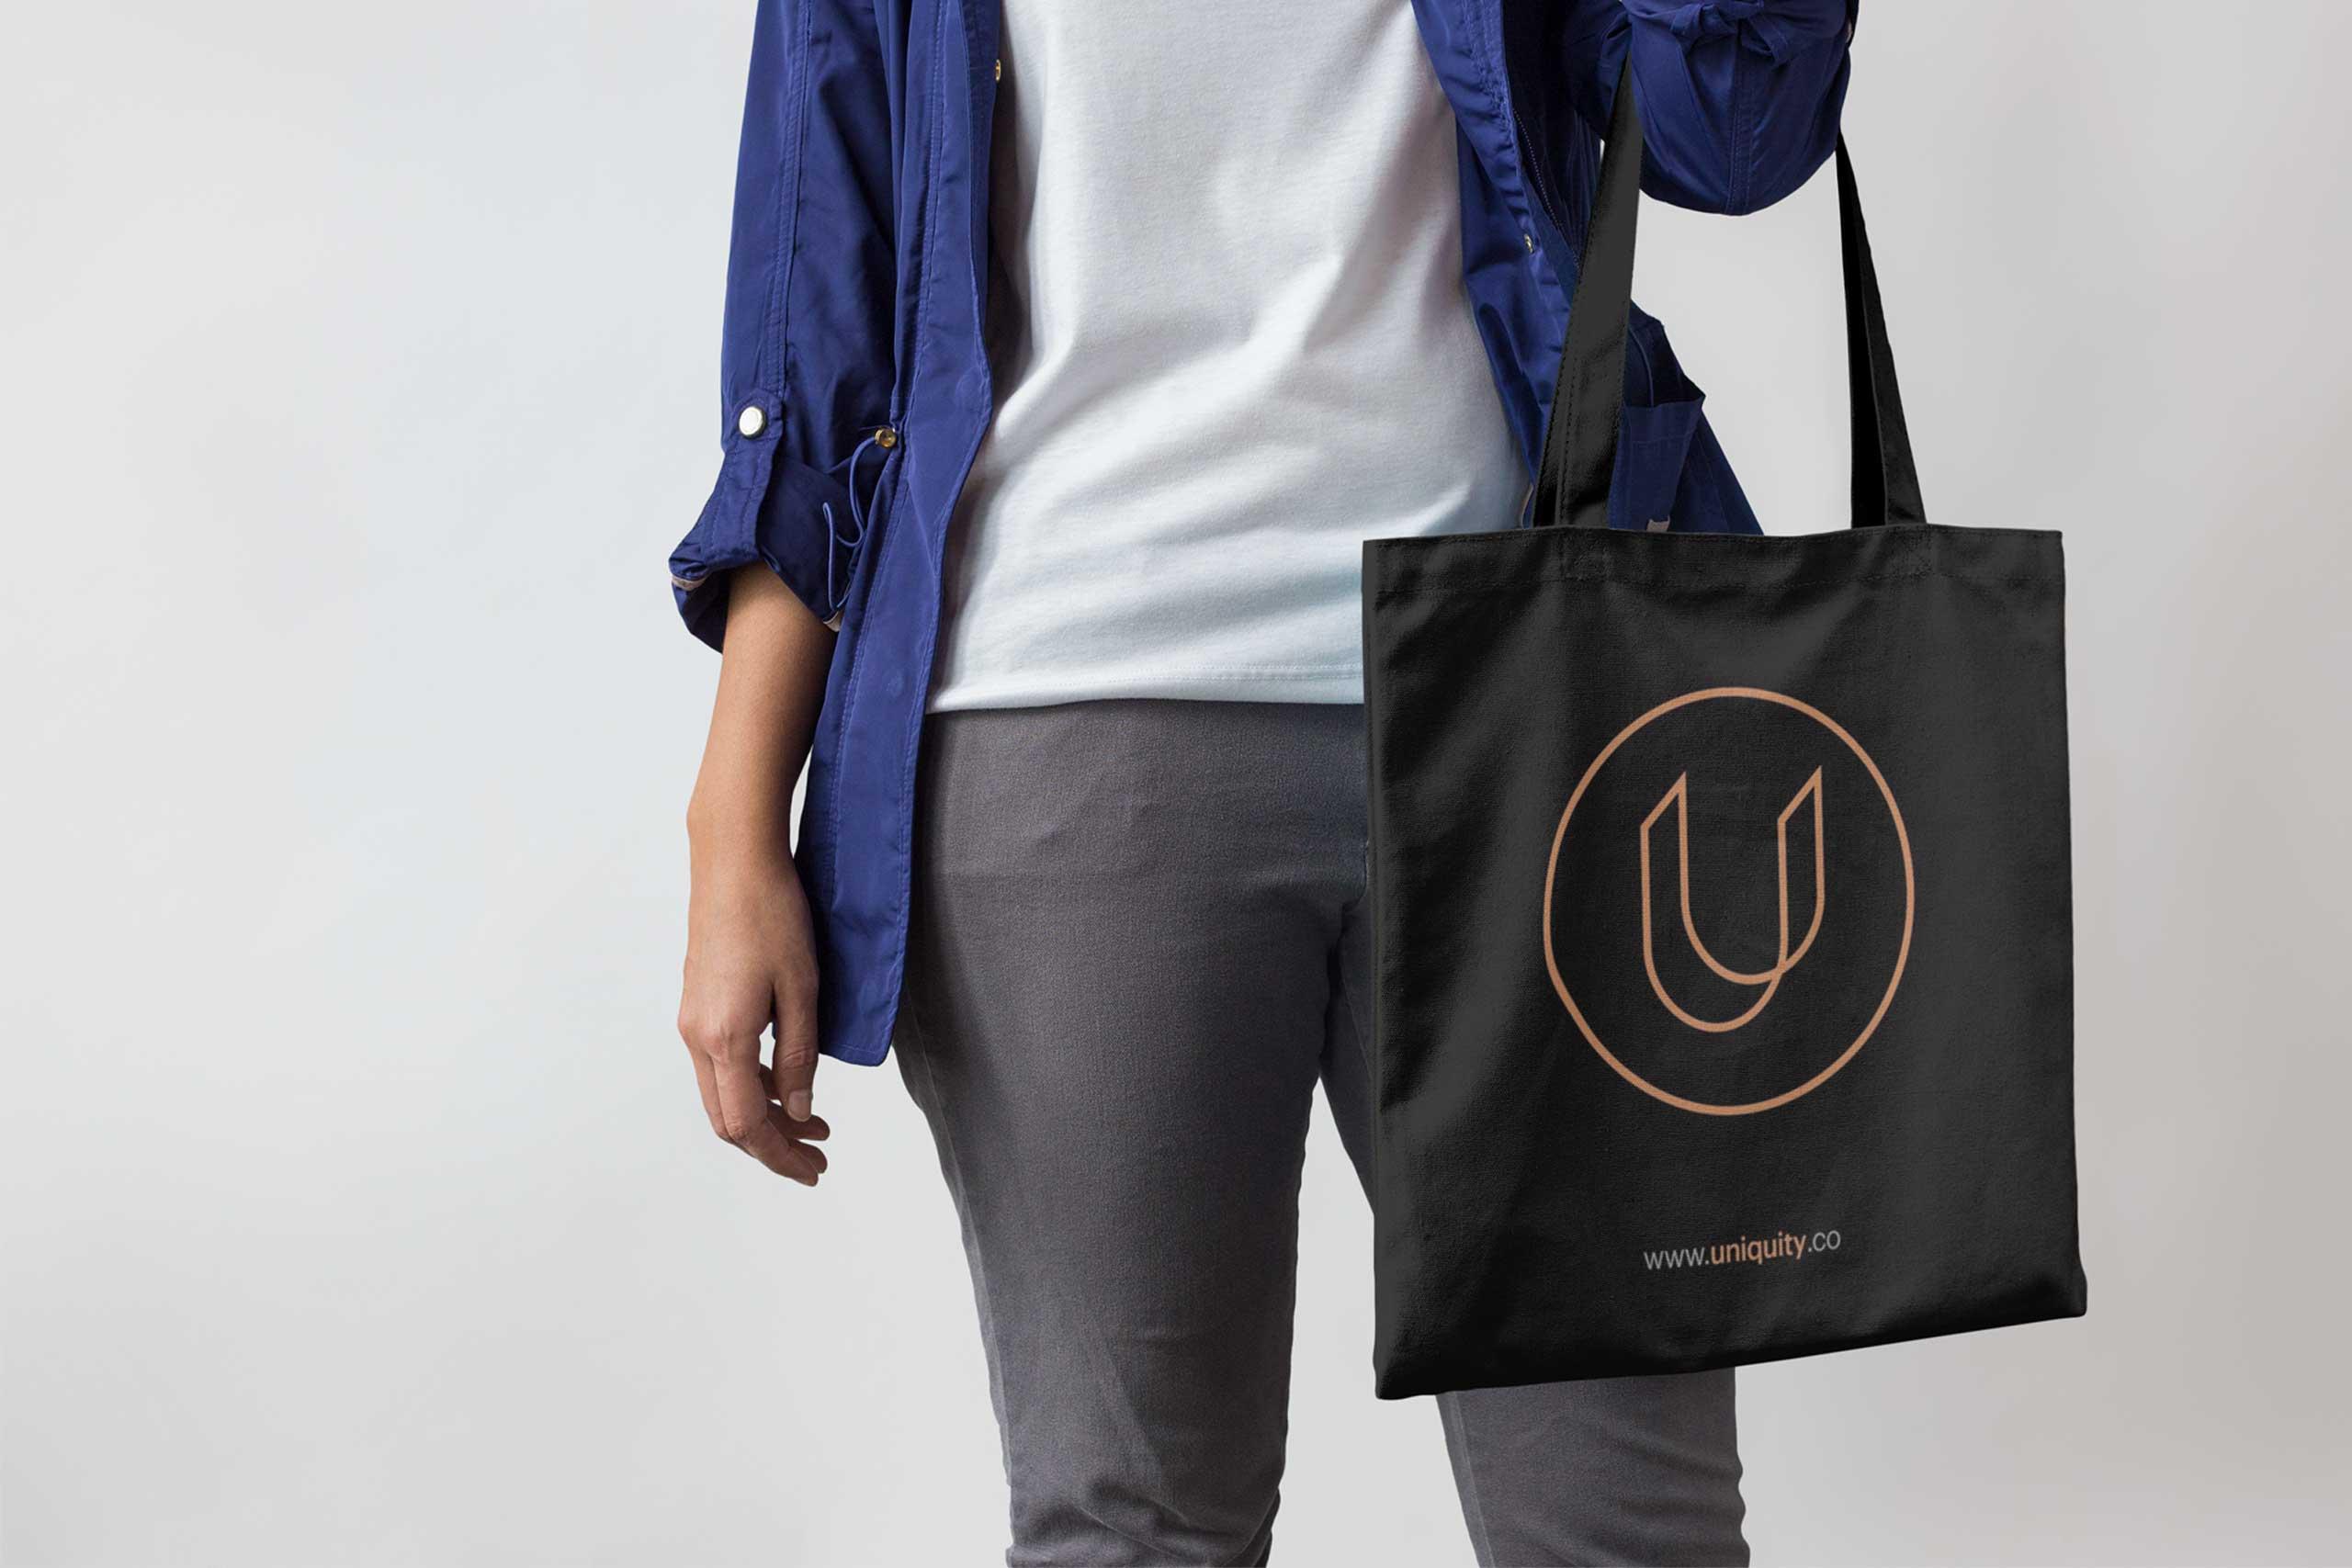 uniquity branding black tote